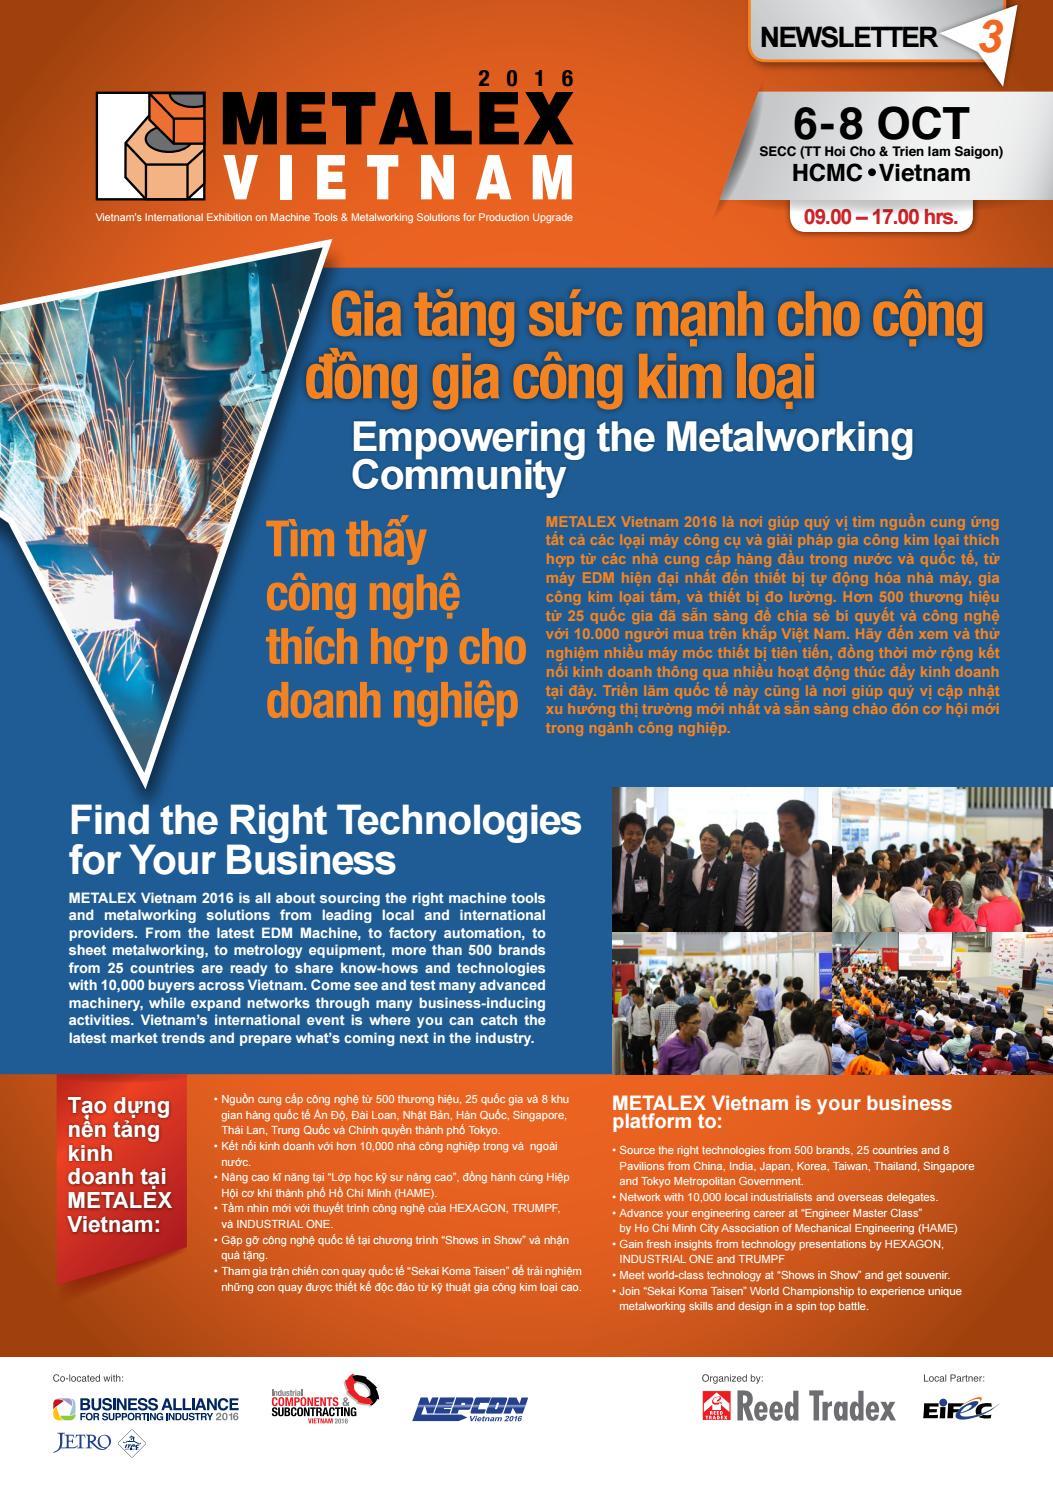 MTX 2015 Product Bulletin #2 by Reed Tradex Co., Ltd. - issuu